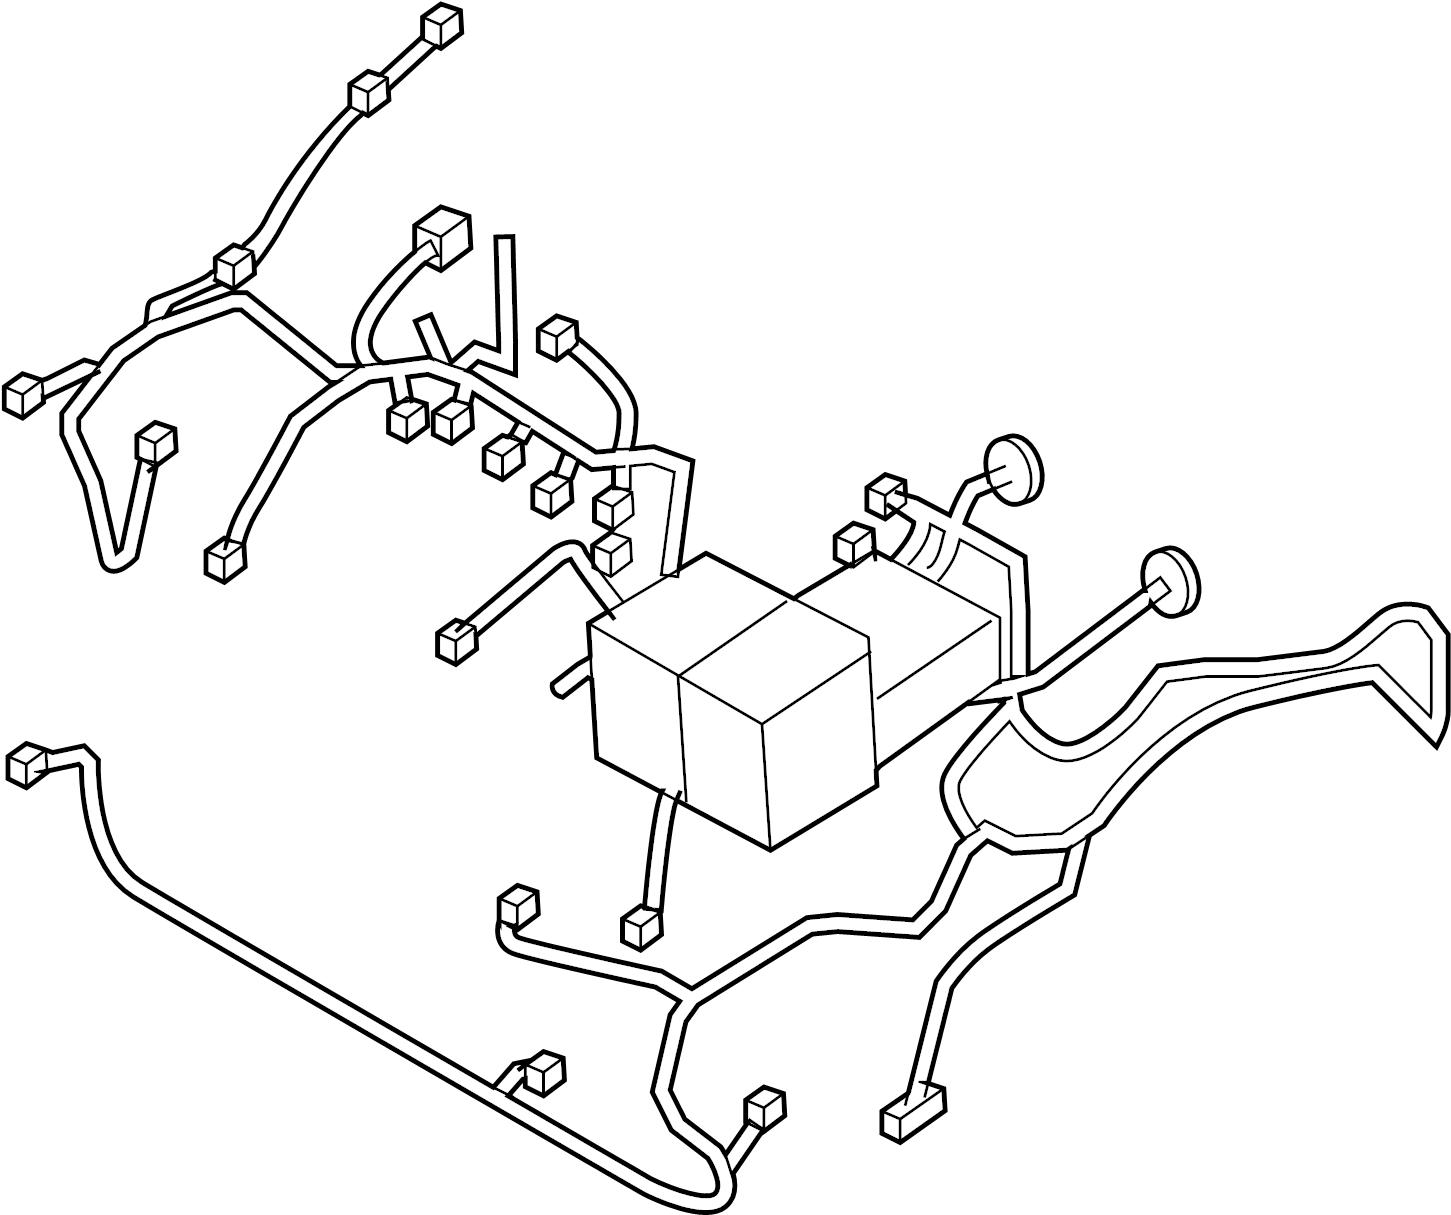 Chevrolet Aveo Engine Wiring Harness. Manual trans, w/o AC